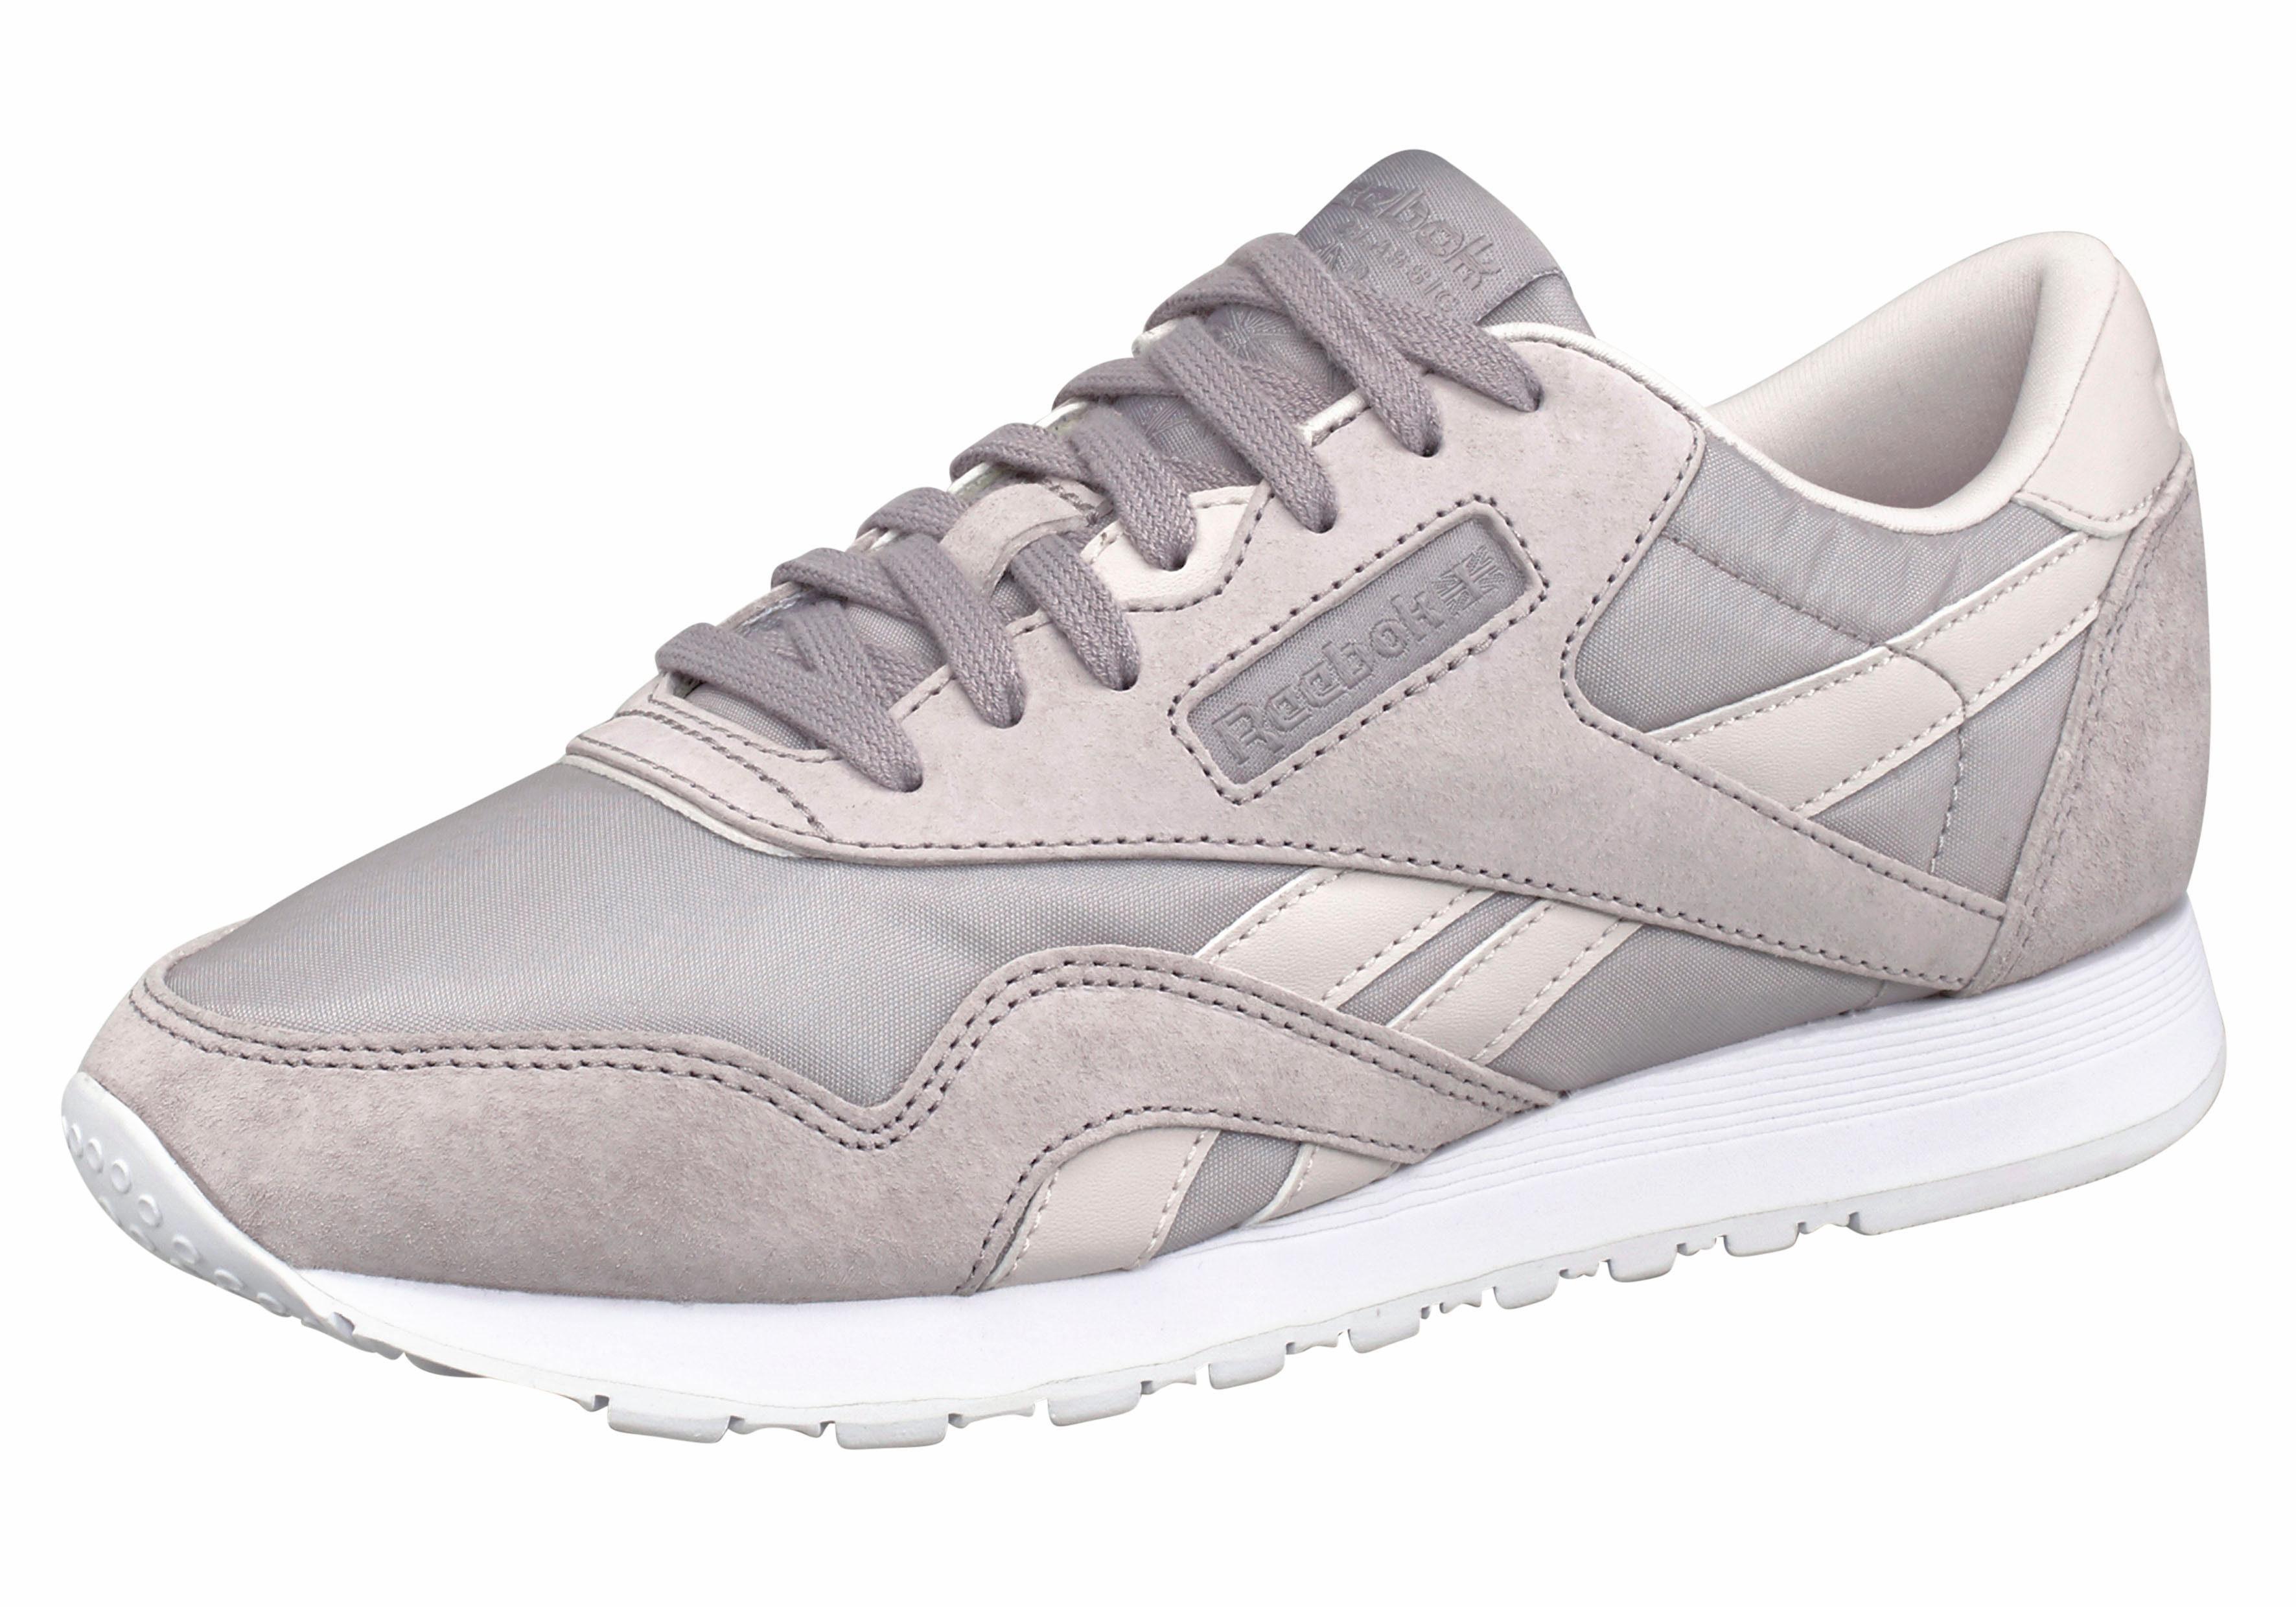 Reebok Classic Classic Leather Nylon x Face Stockholm Sneaker online kaufen  flieder